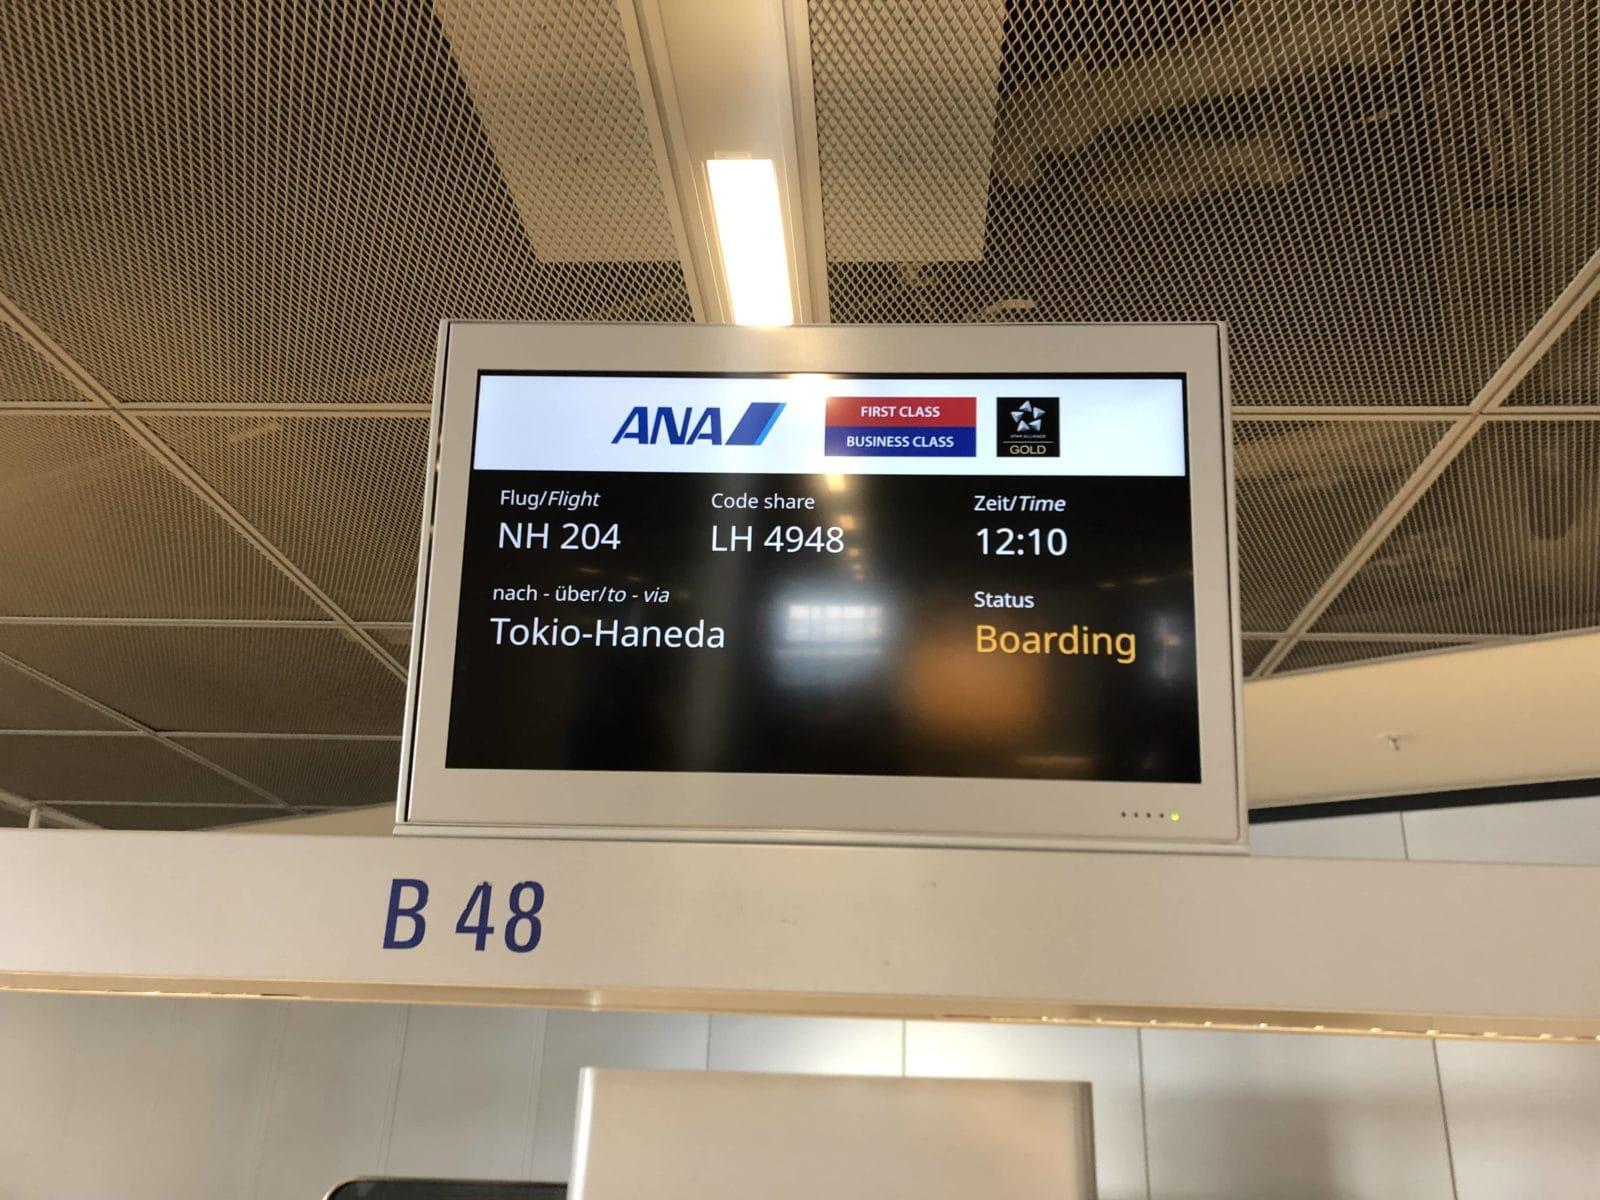 ana business class boeing 777 300 flug nh204